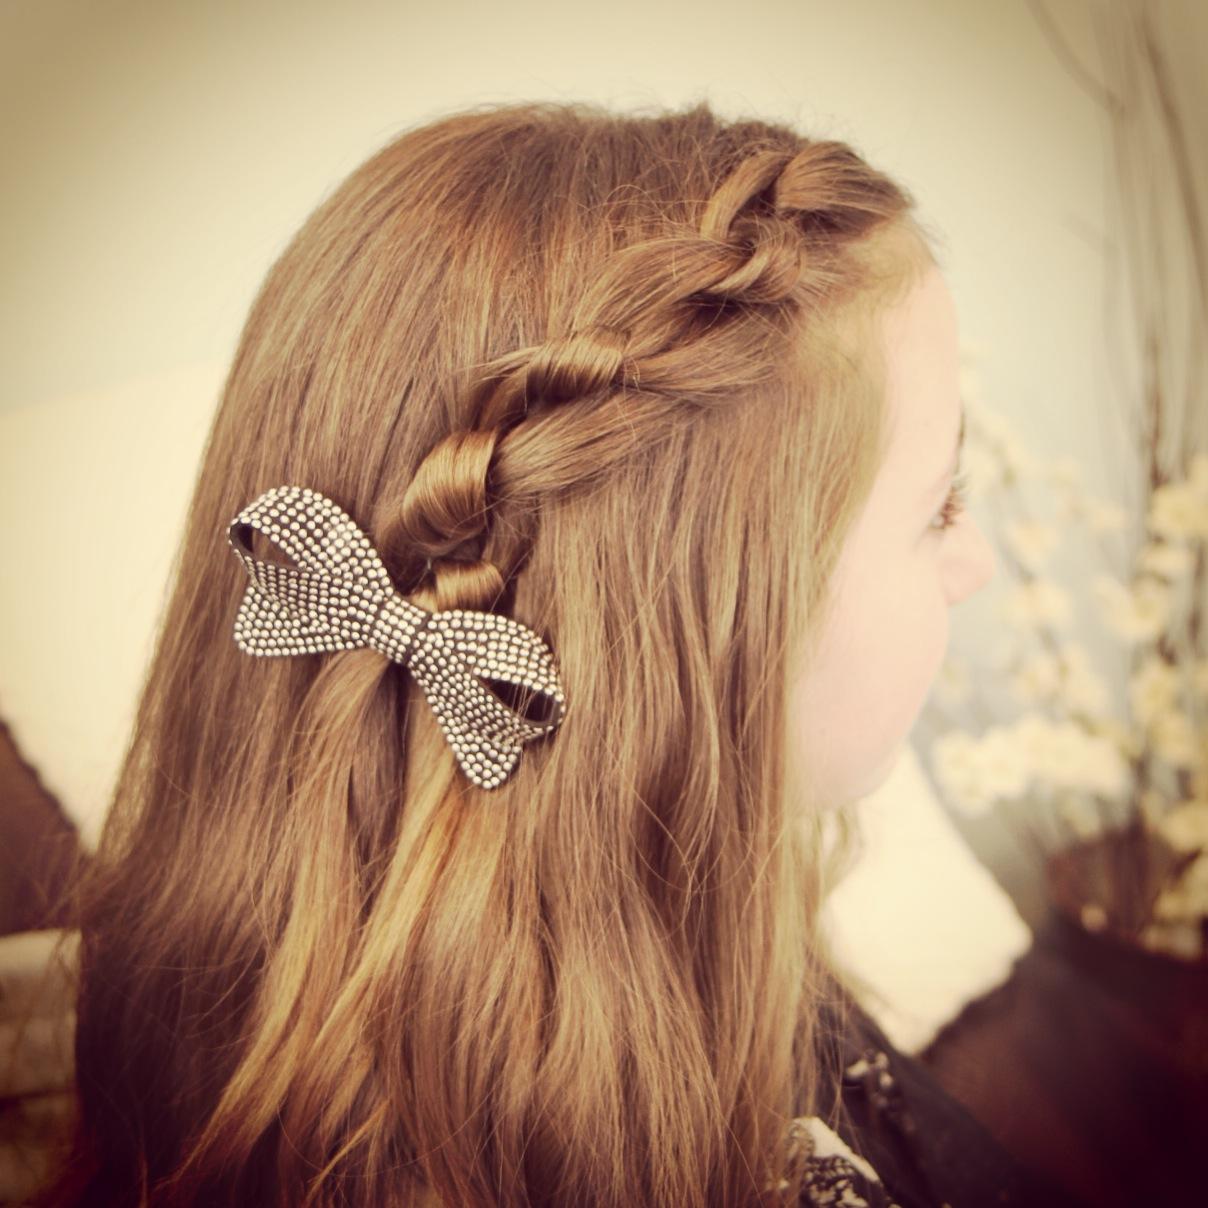 Cool Hairstyles 4 School : Photo cute girls hairstyles